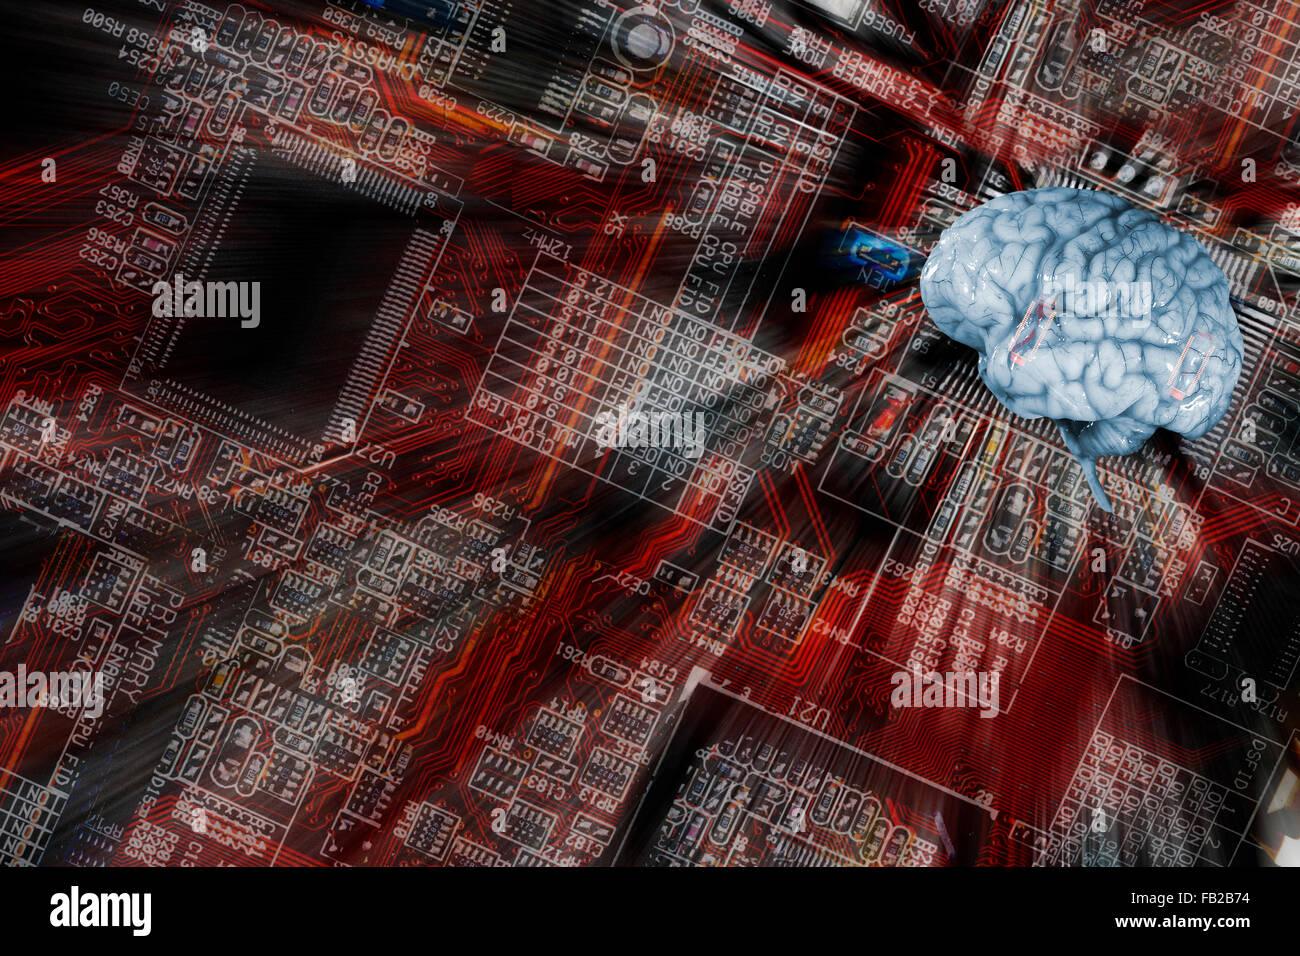 artificial-intelligence, human brain and communication - Stock Image